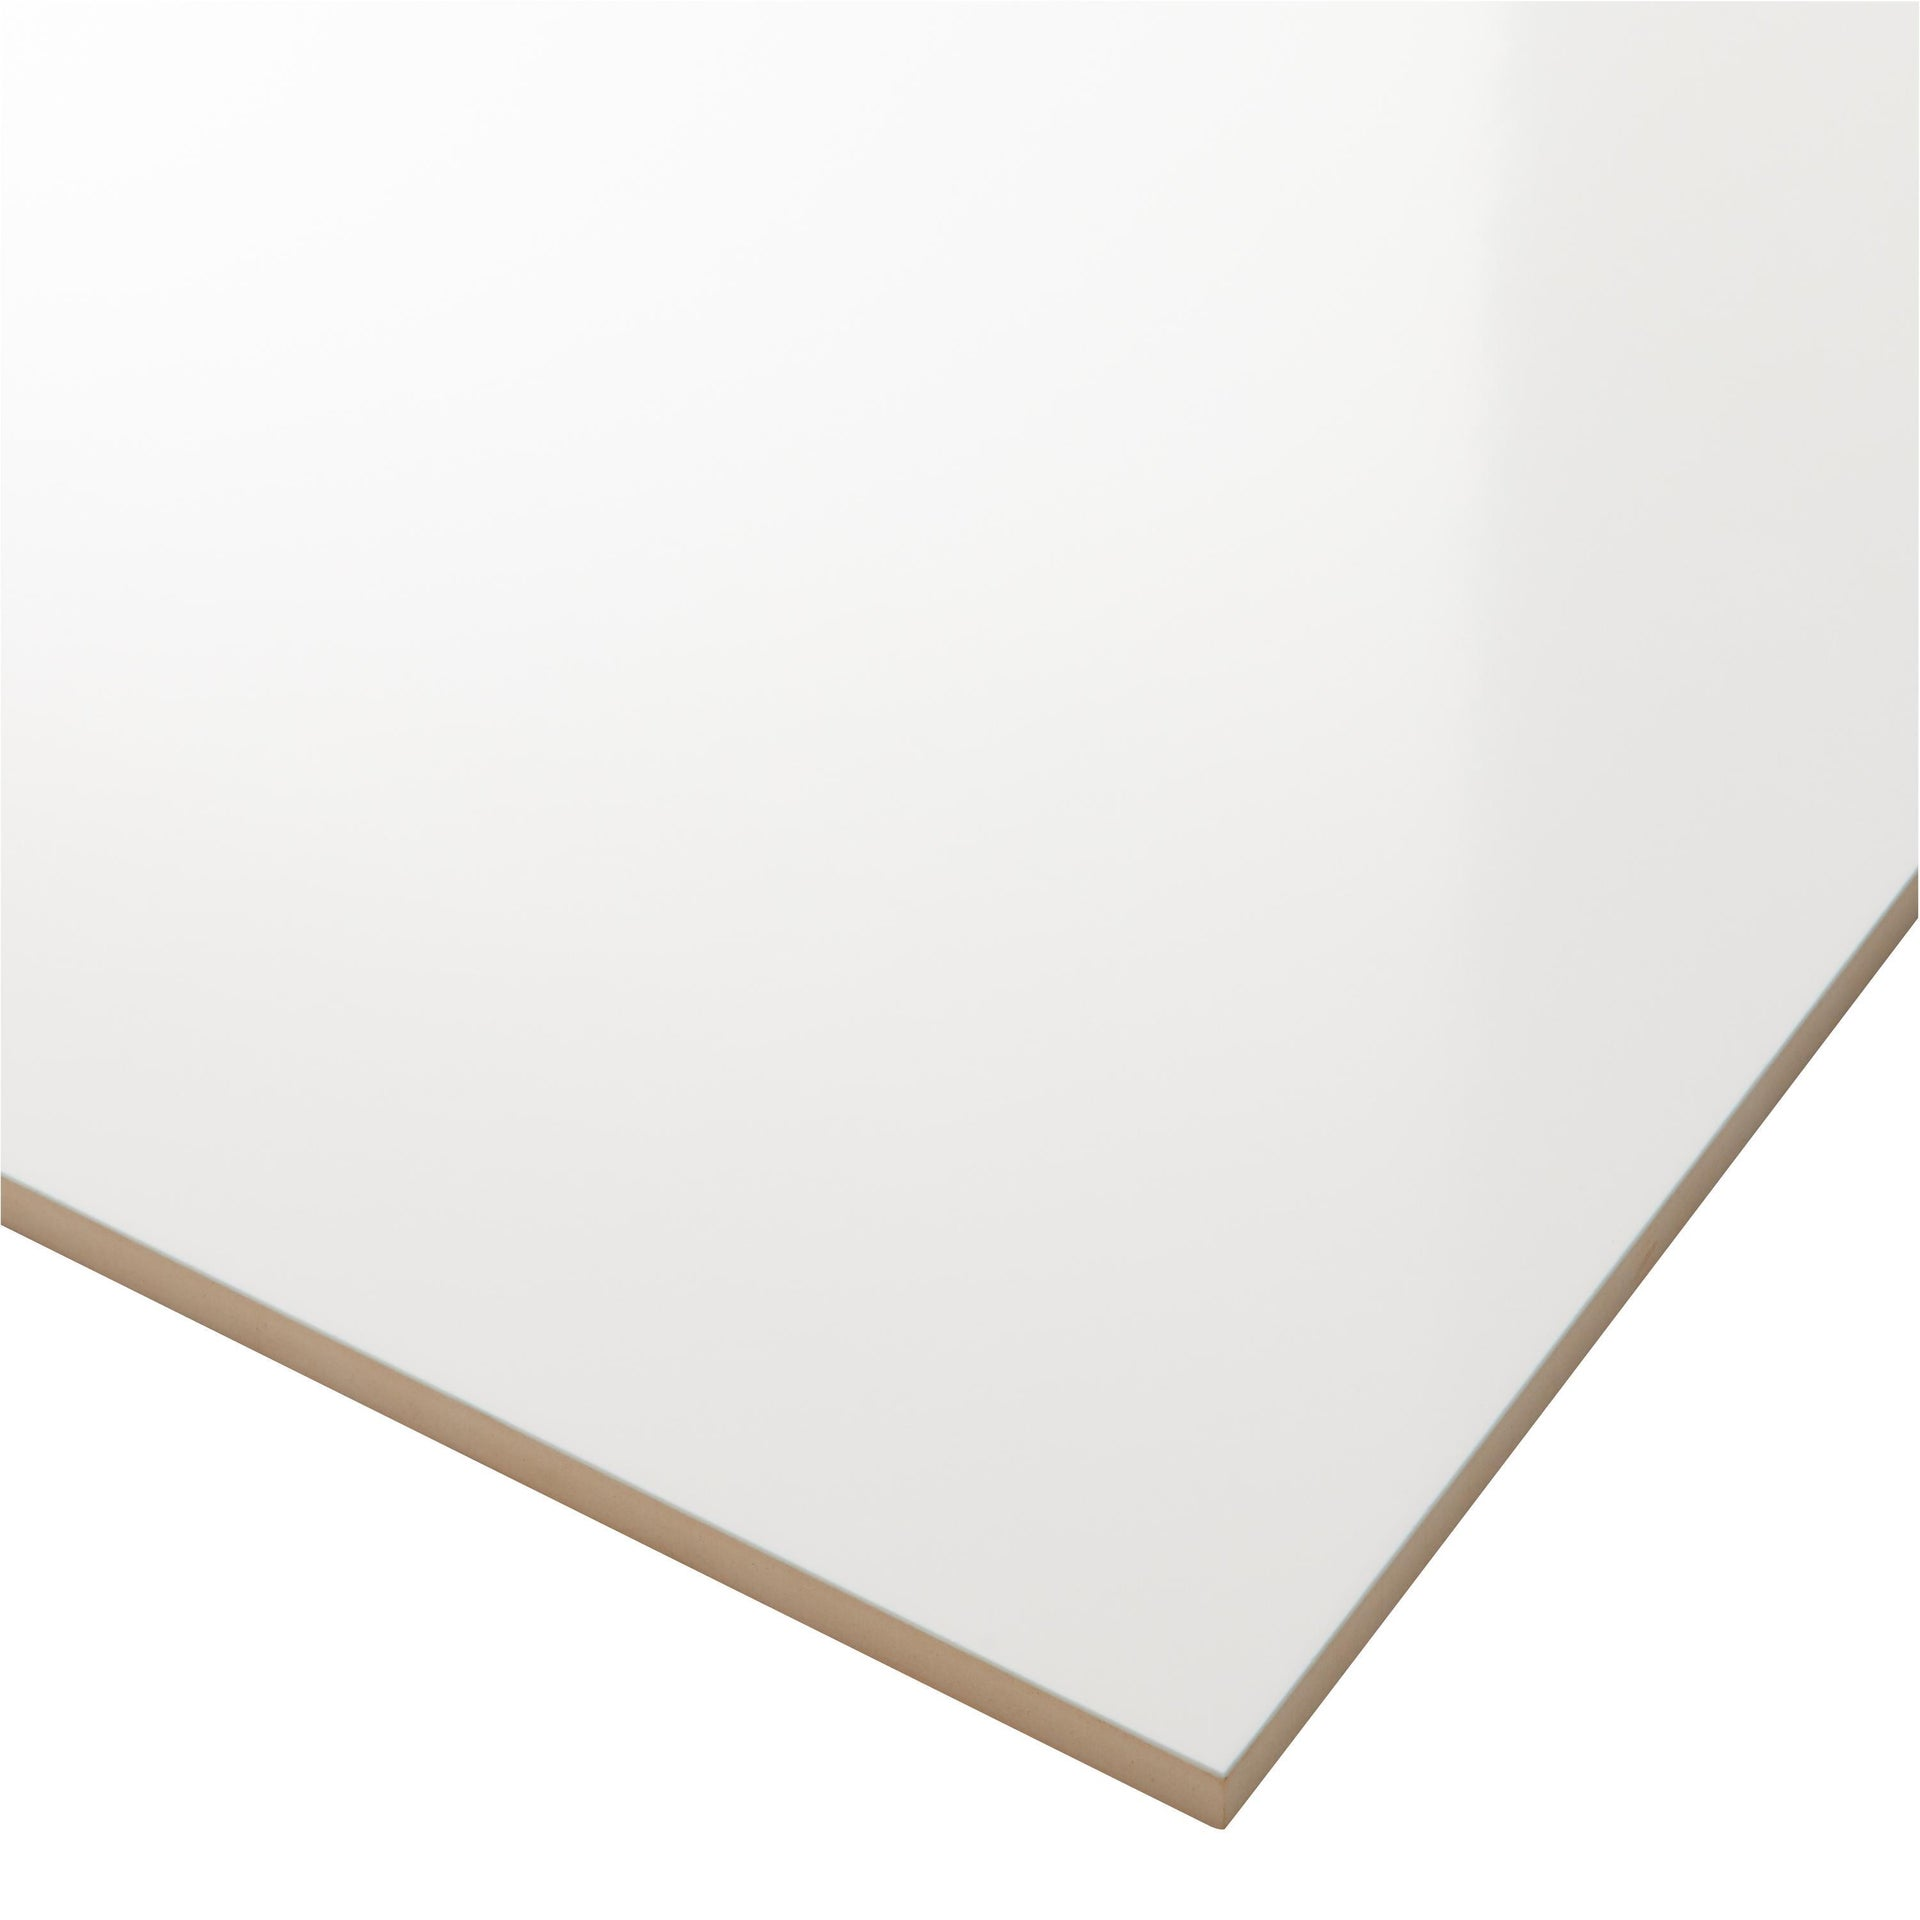 Piastrella per rivestimenti Arctic 30 x 60 cm sp. 9 mm bianco - 6